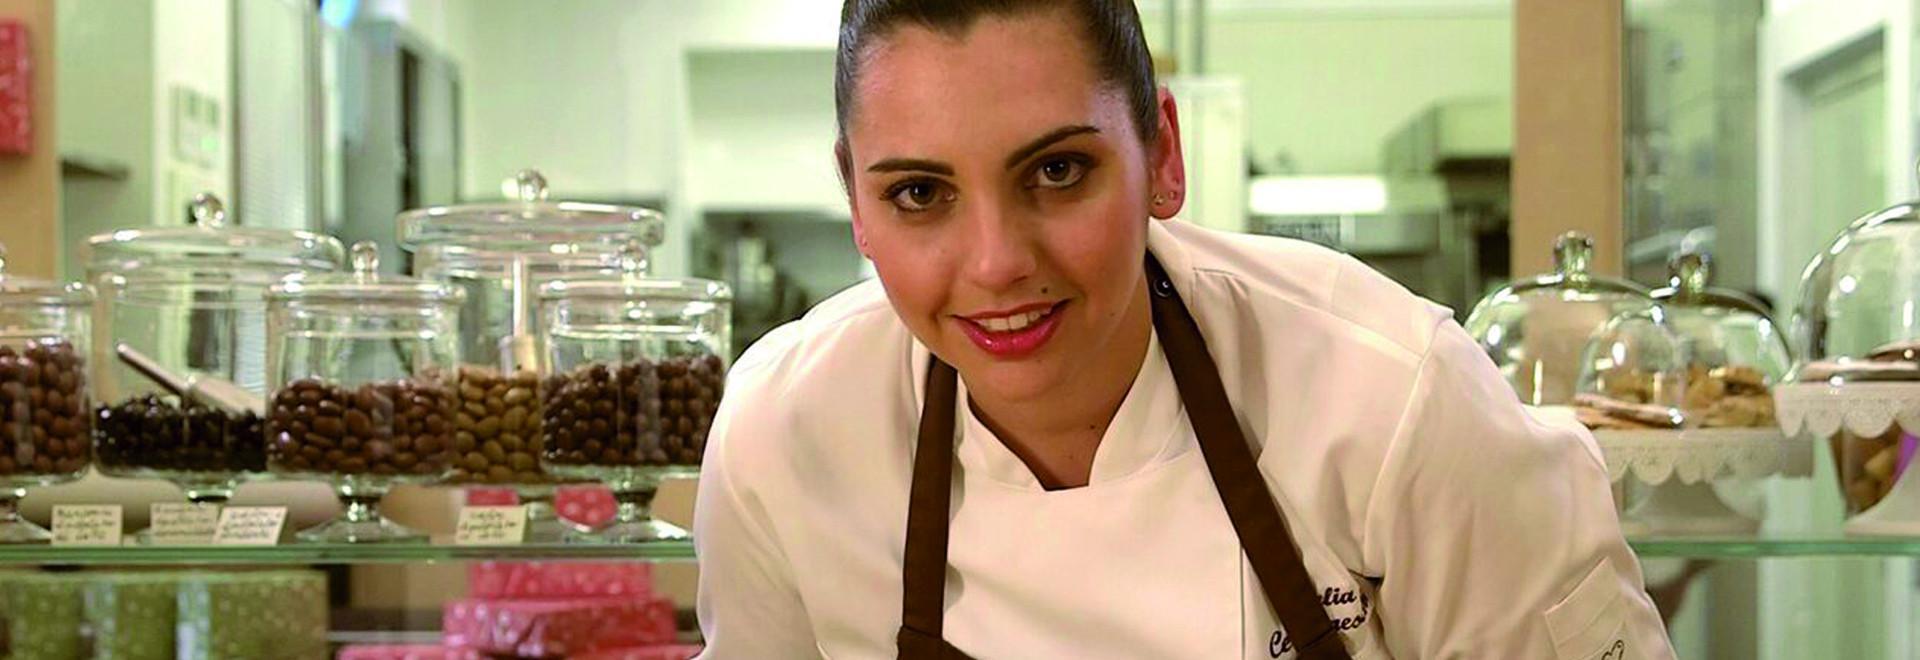 Sweet Giulia